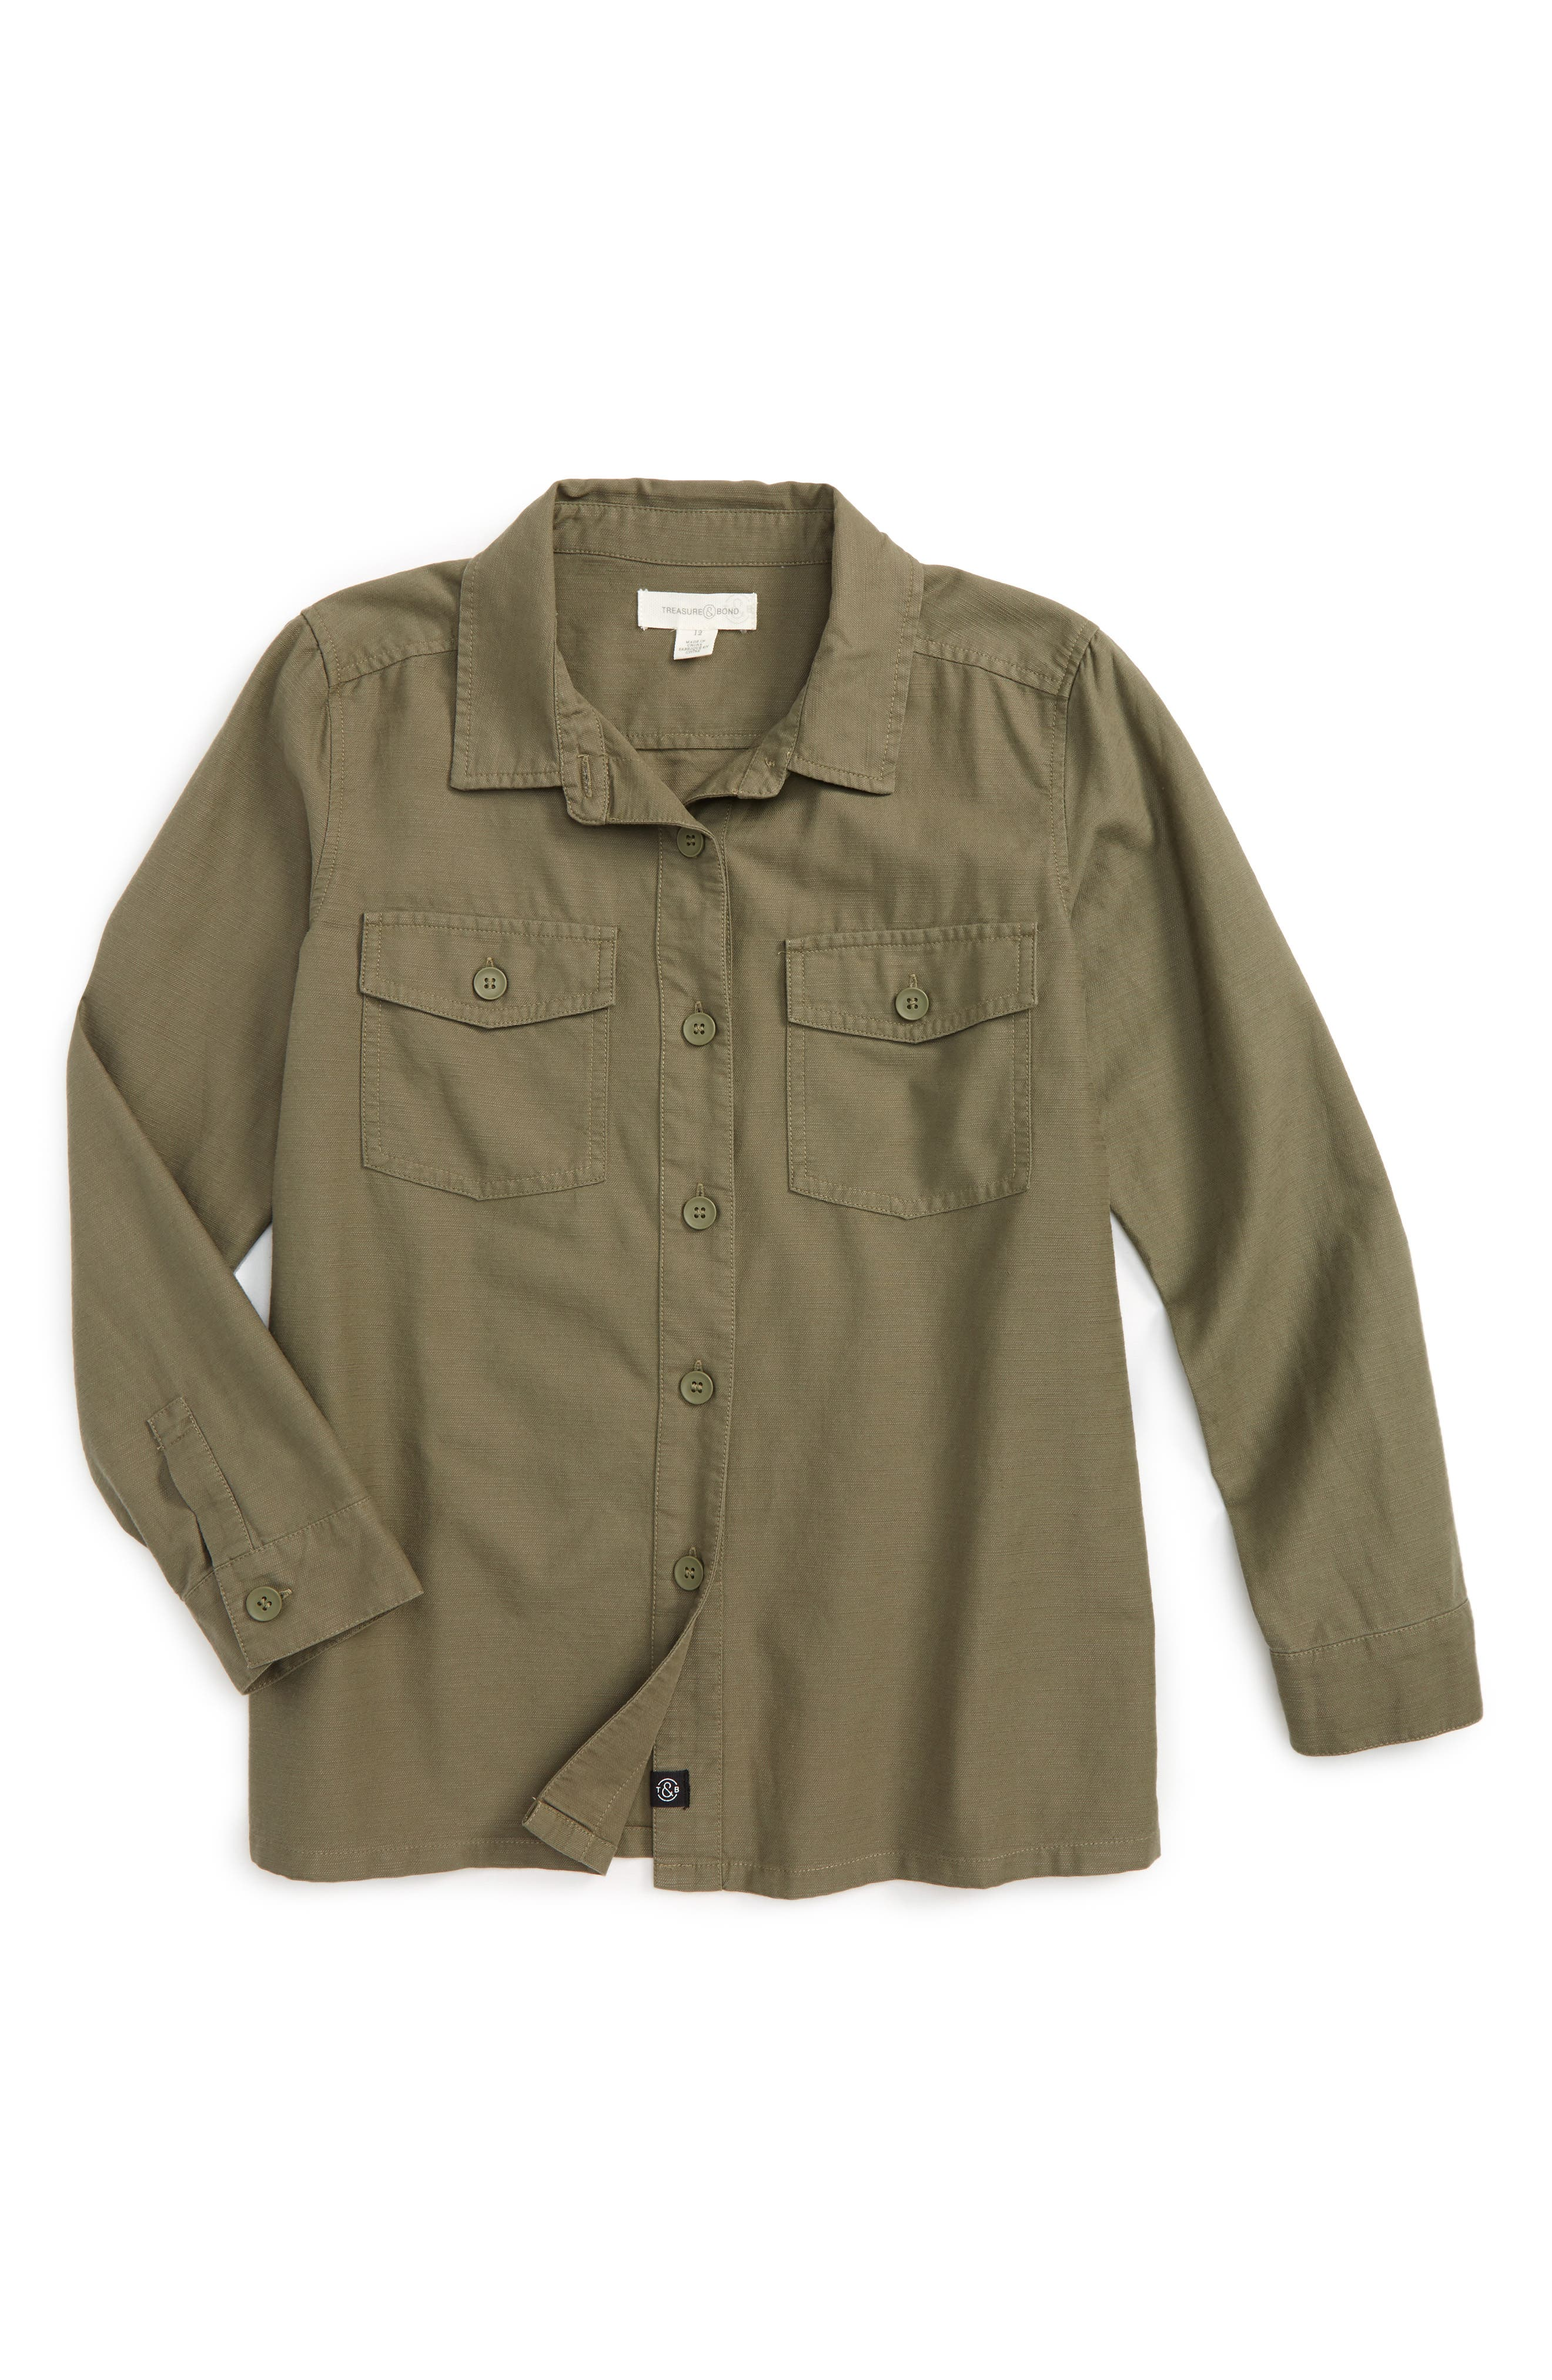 TREASURE & BOND,                             Utility Shirt,                             Main thumbnail 1, color,                             311